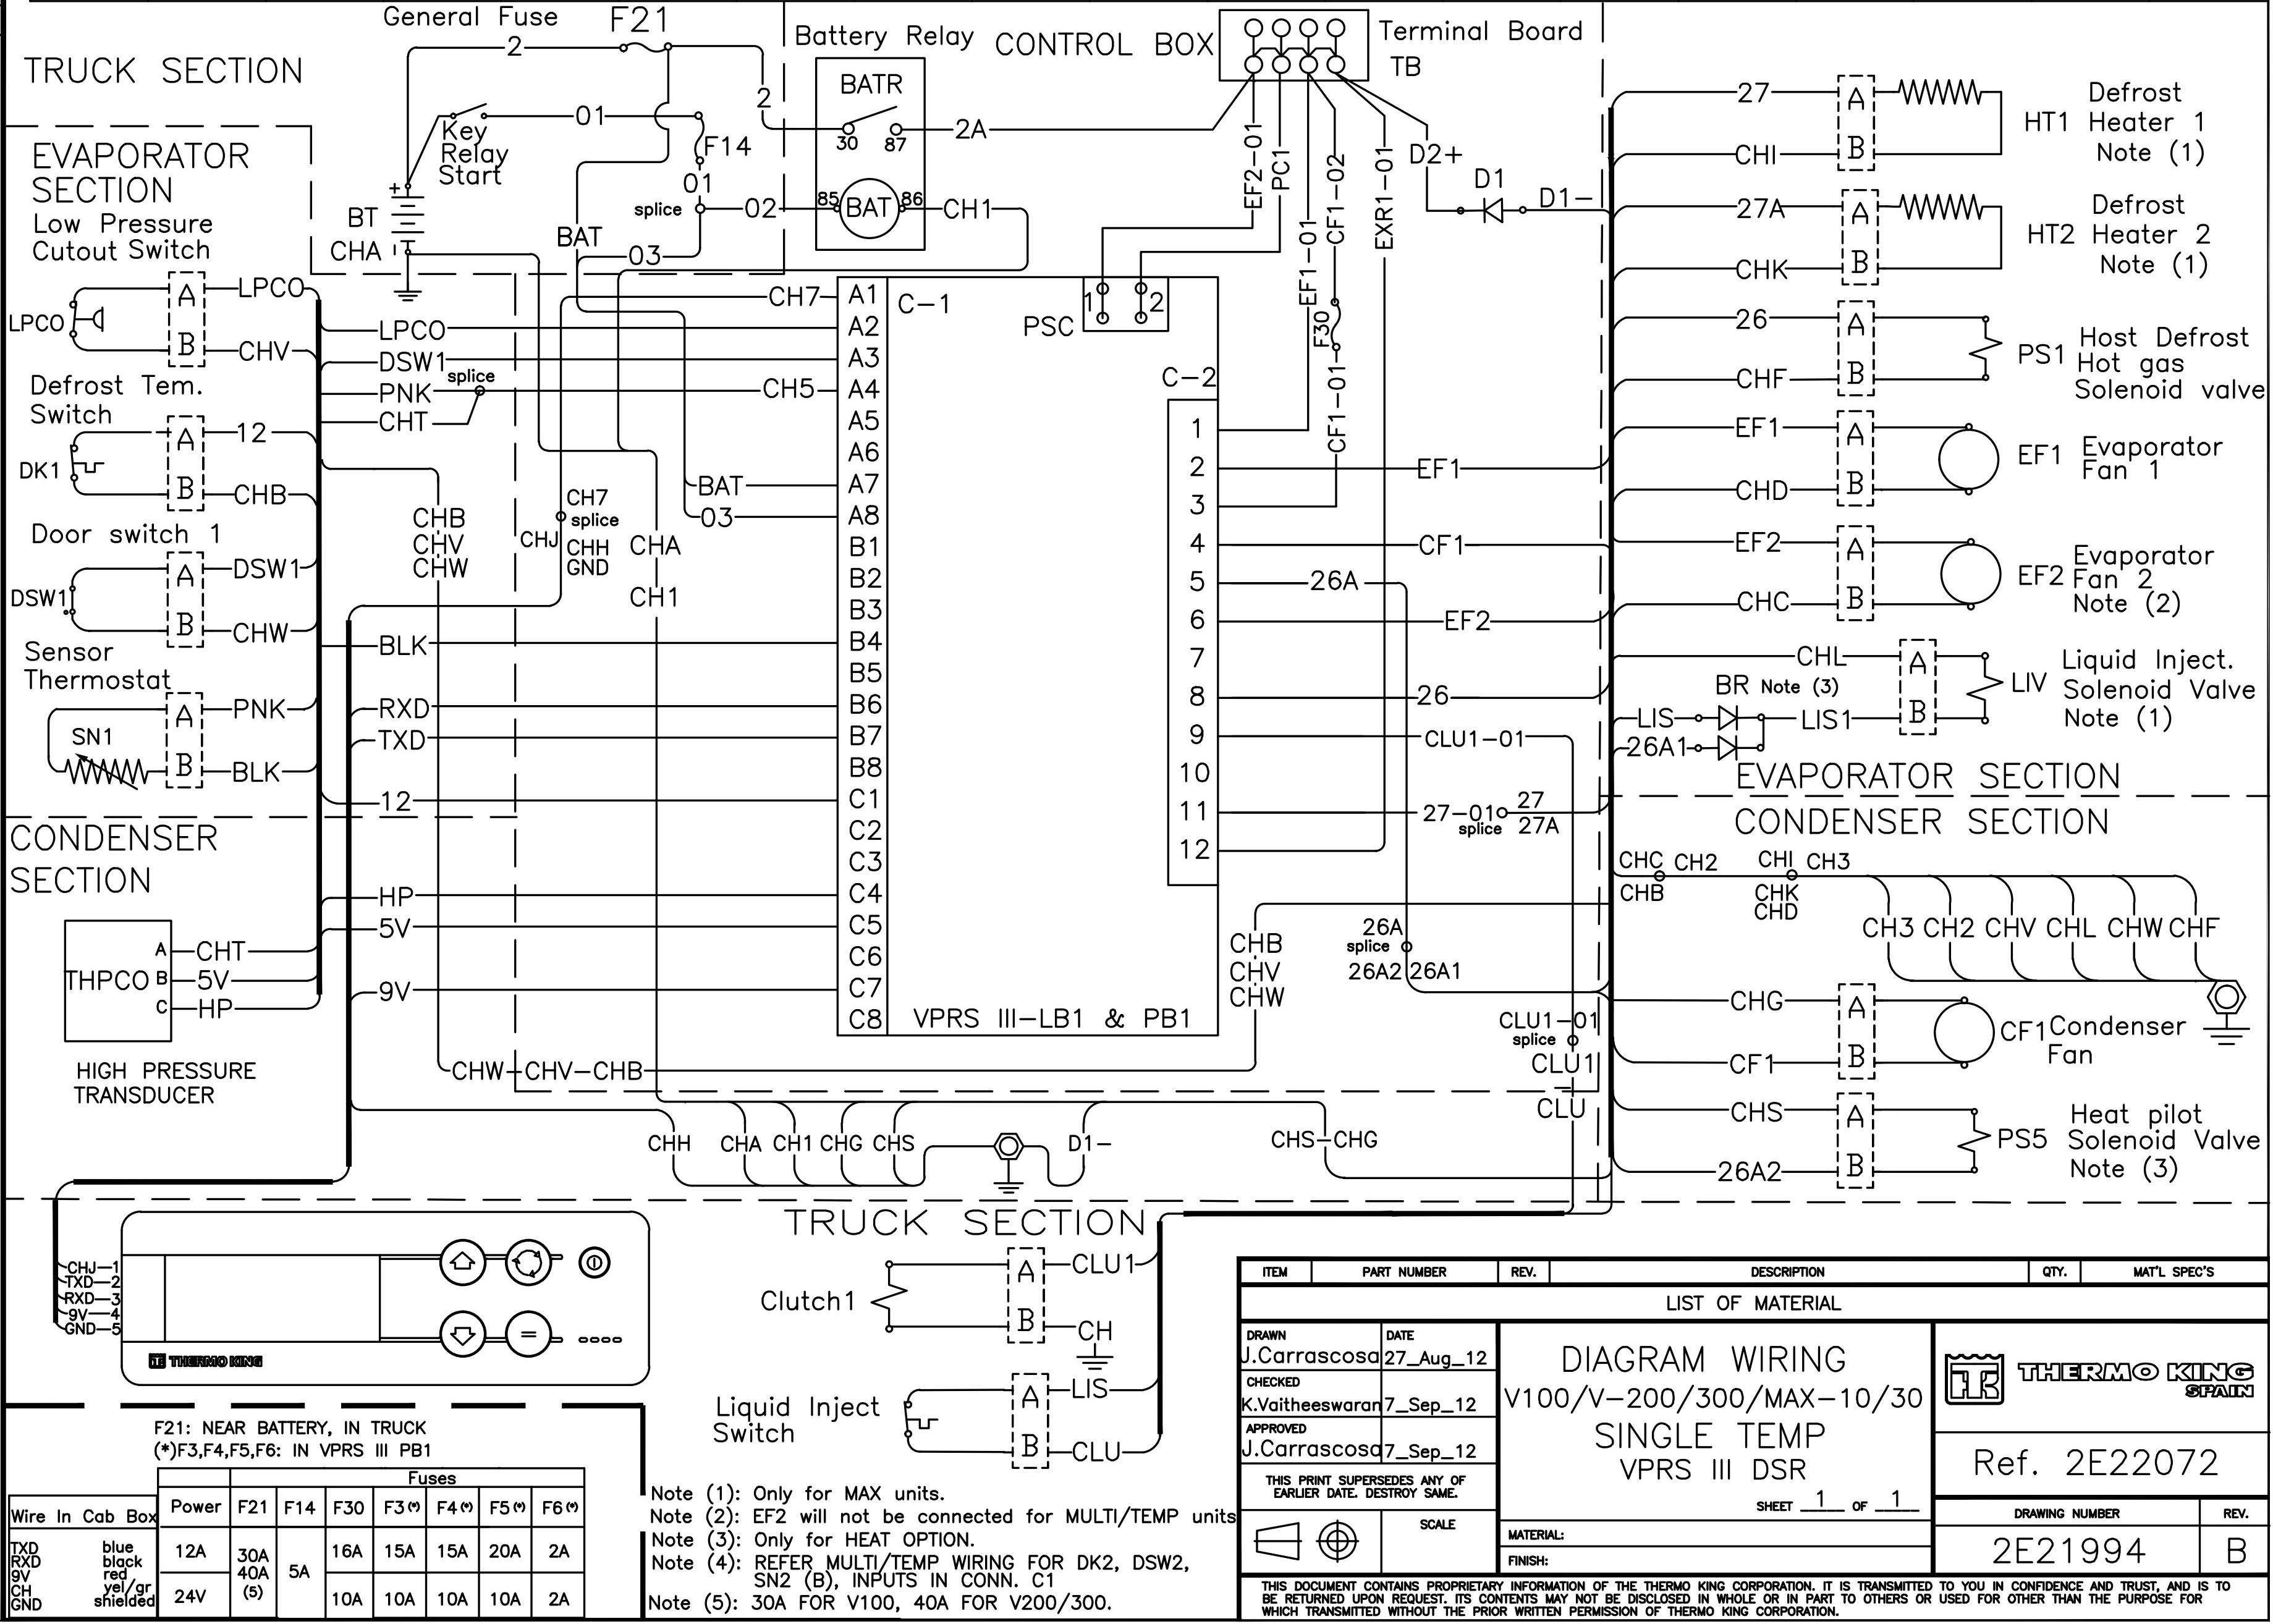 Diagram Bale King Wiring Diagram Full Version Hd Quality Wiring Diagram Sharediagrams Museotresnuraghes It